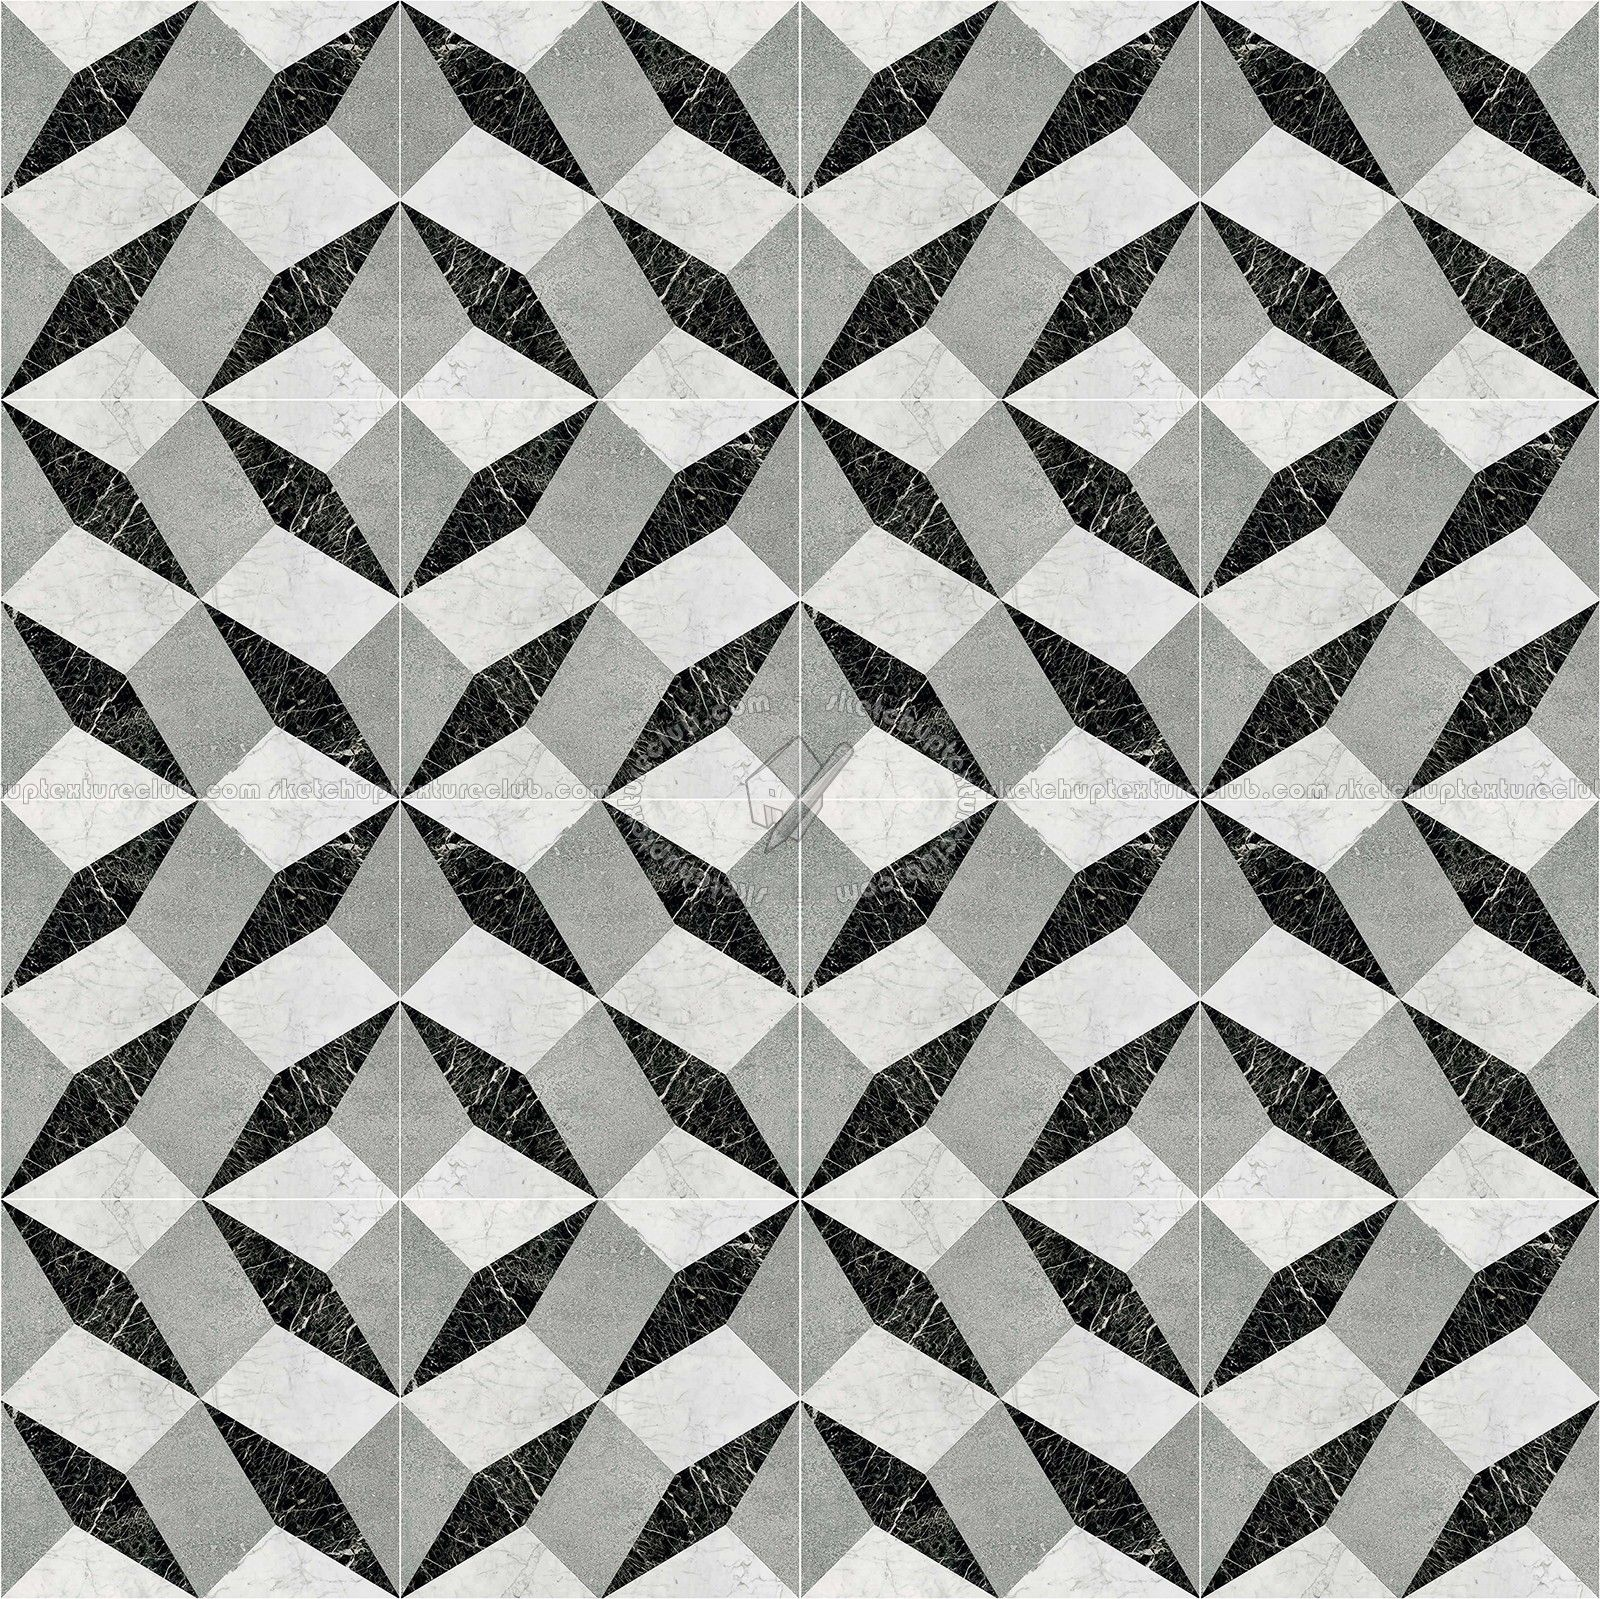 Texture Seamless | Illusion Black White Marble Floor Tile Texture Seamless  14822u2026